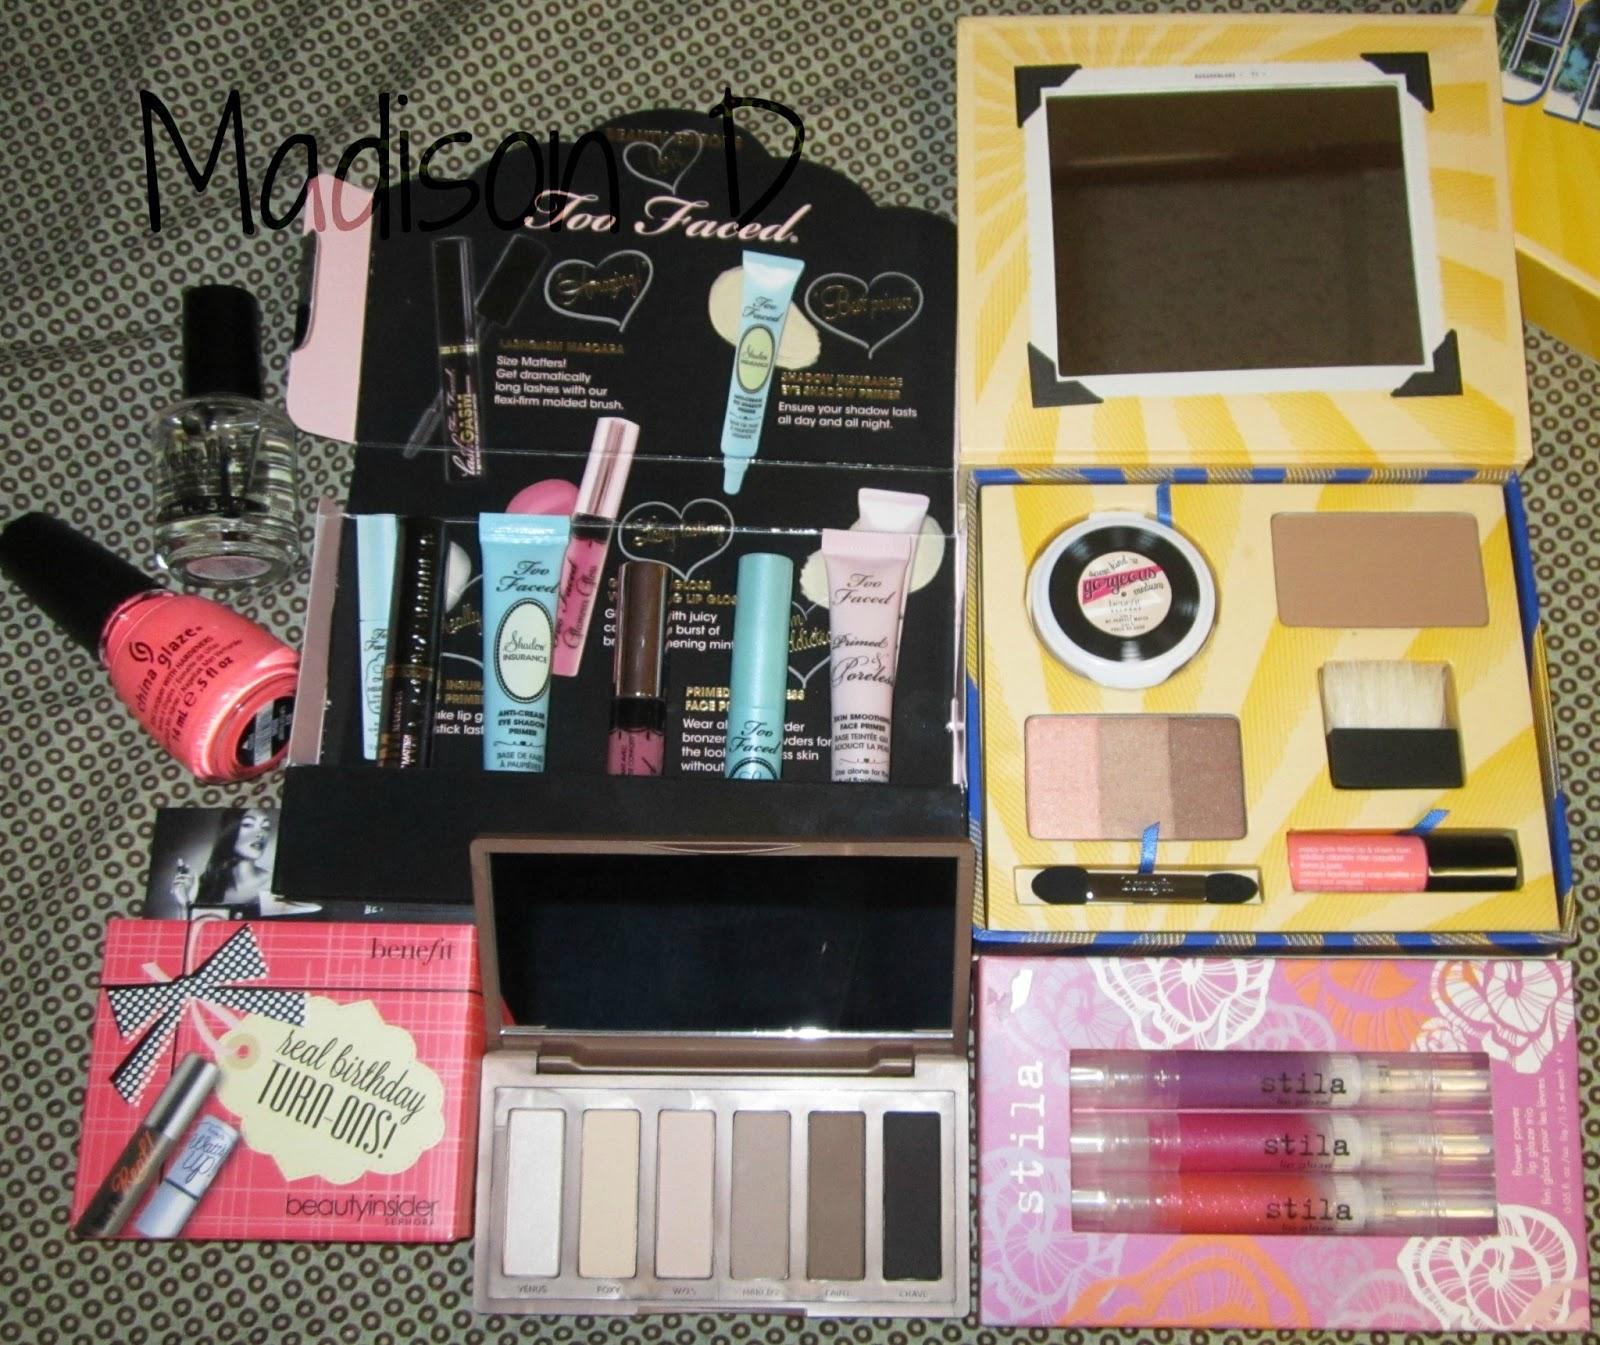 Madison's Nails & Makeup: Birthday Gifts & Haul